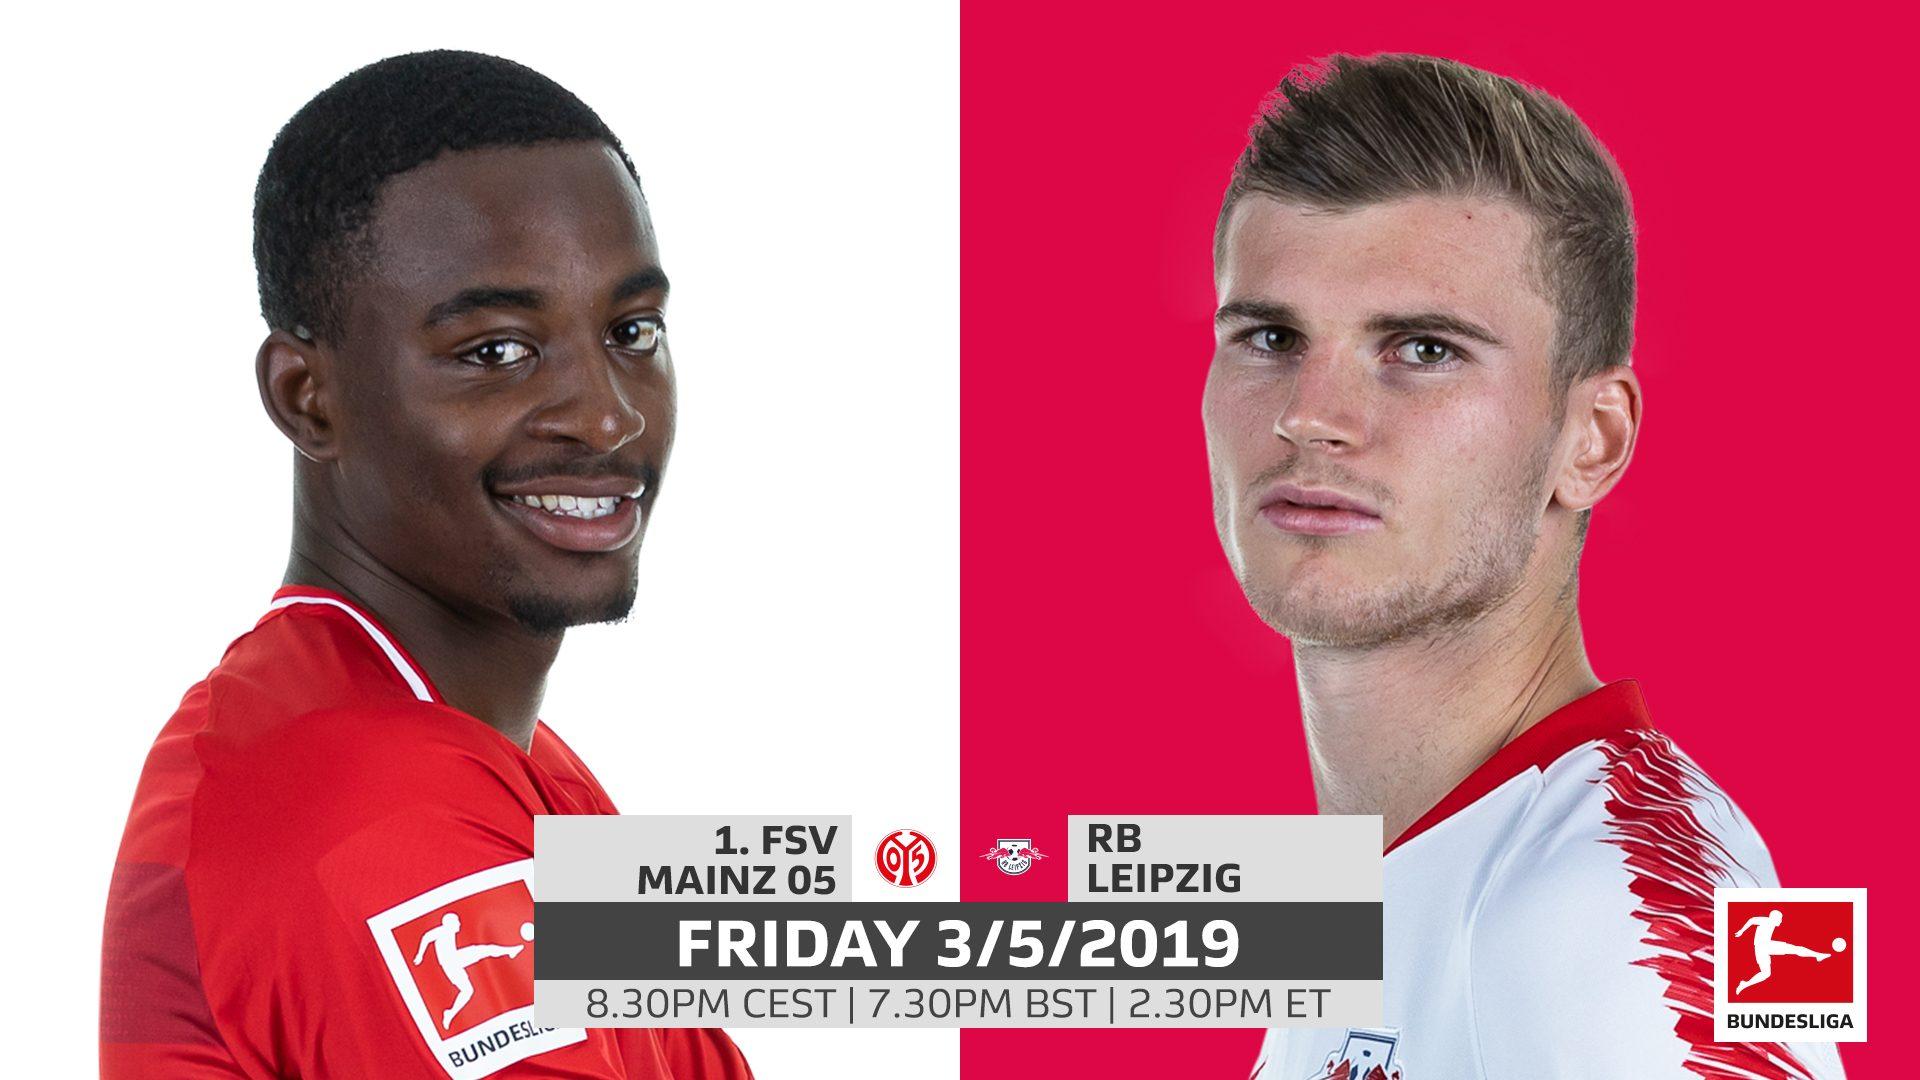 Mainz vs. RB Leipzig: probable line-ups, match stats and LIVE blog!